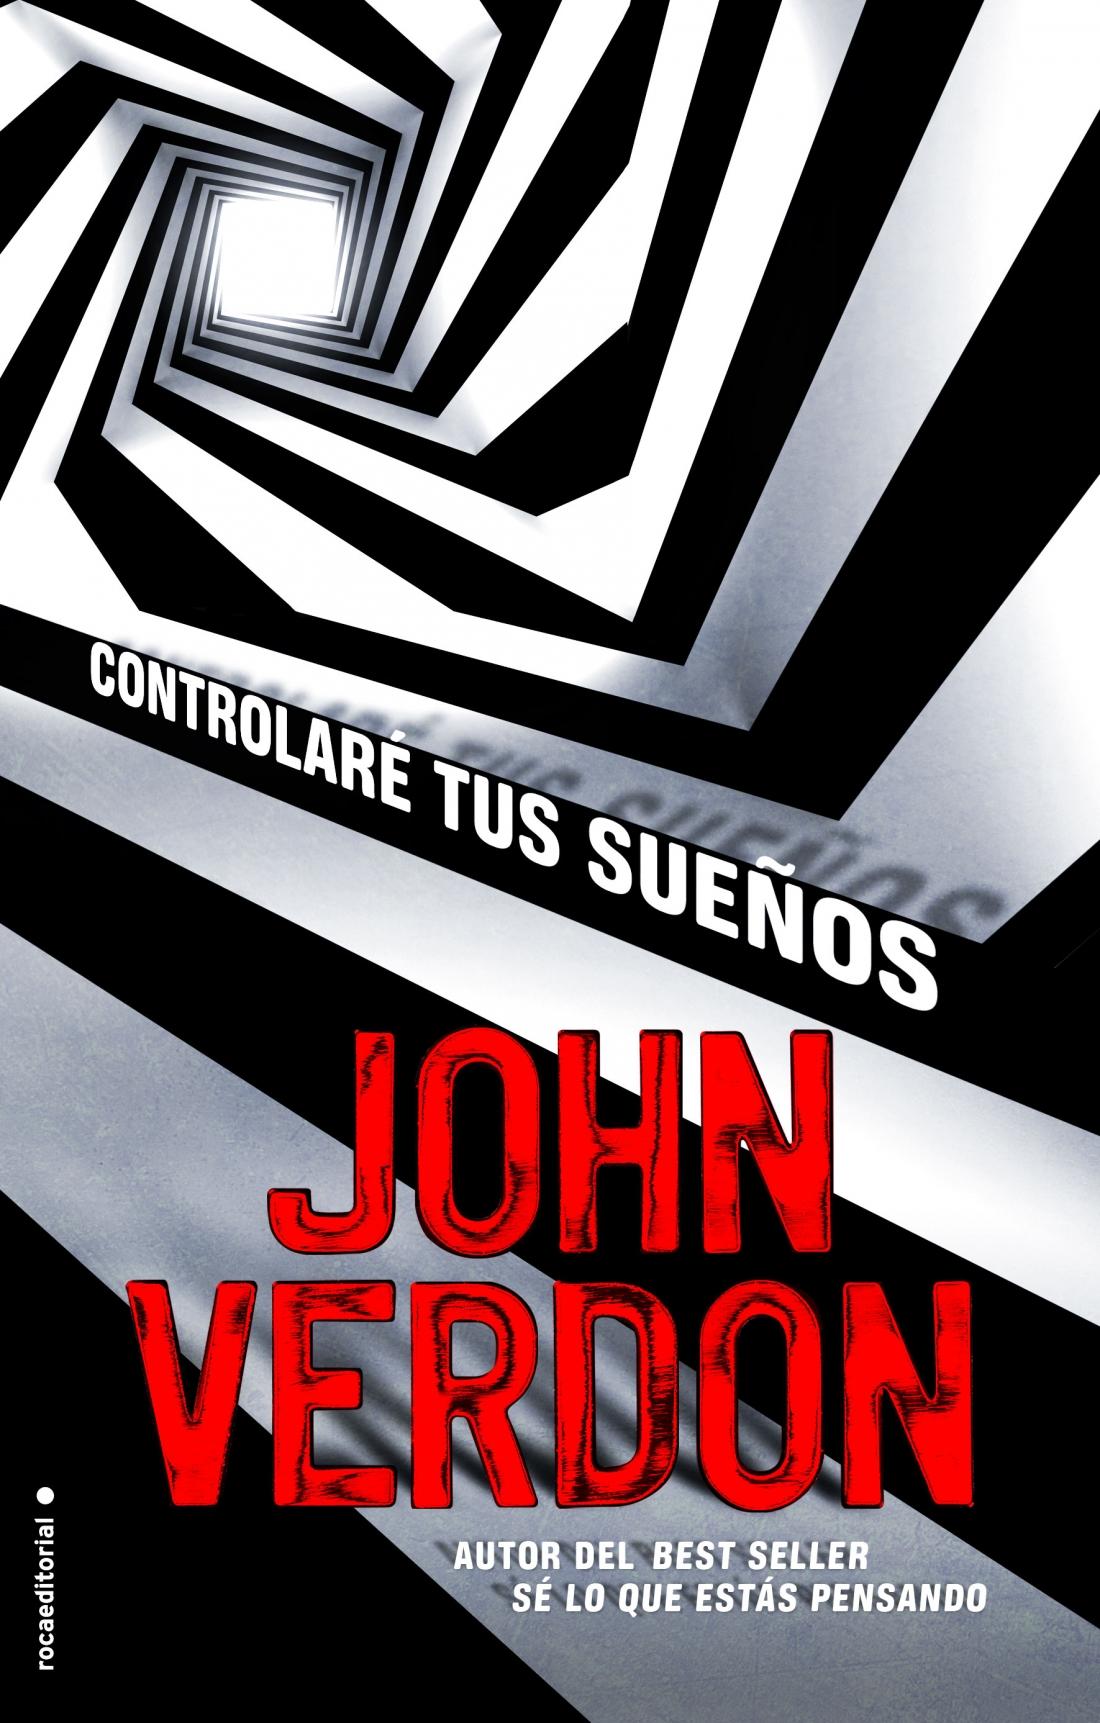 Controlare tus sueños - John Verdon Portada